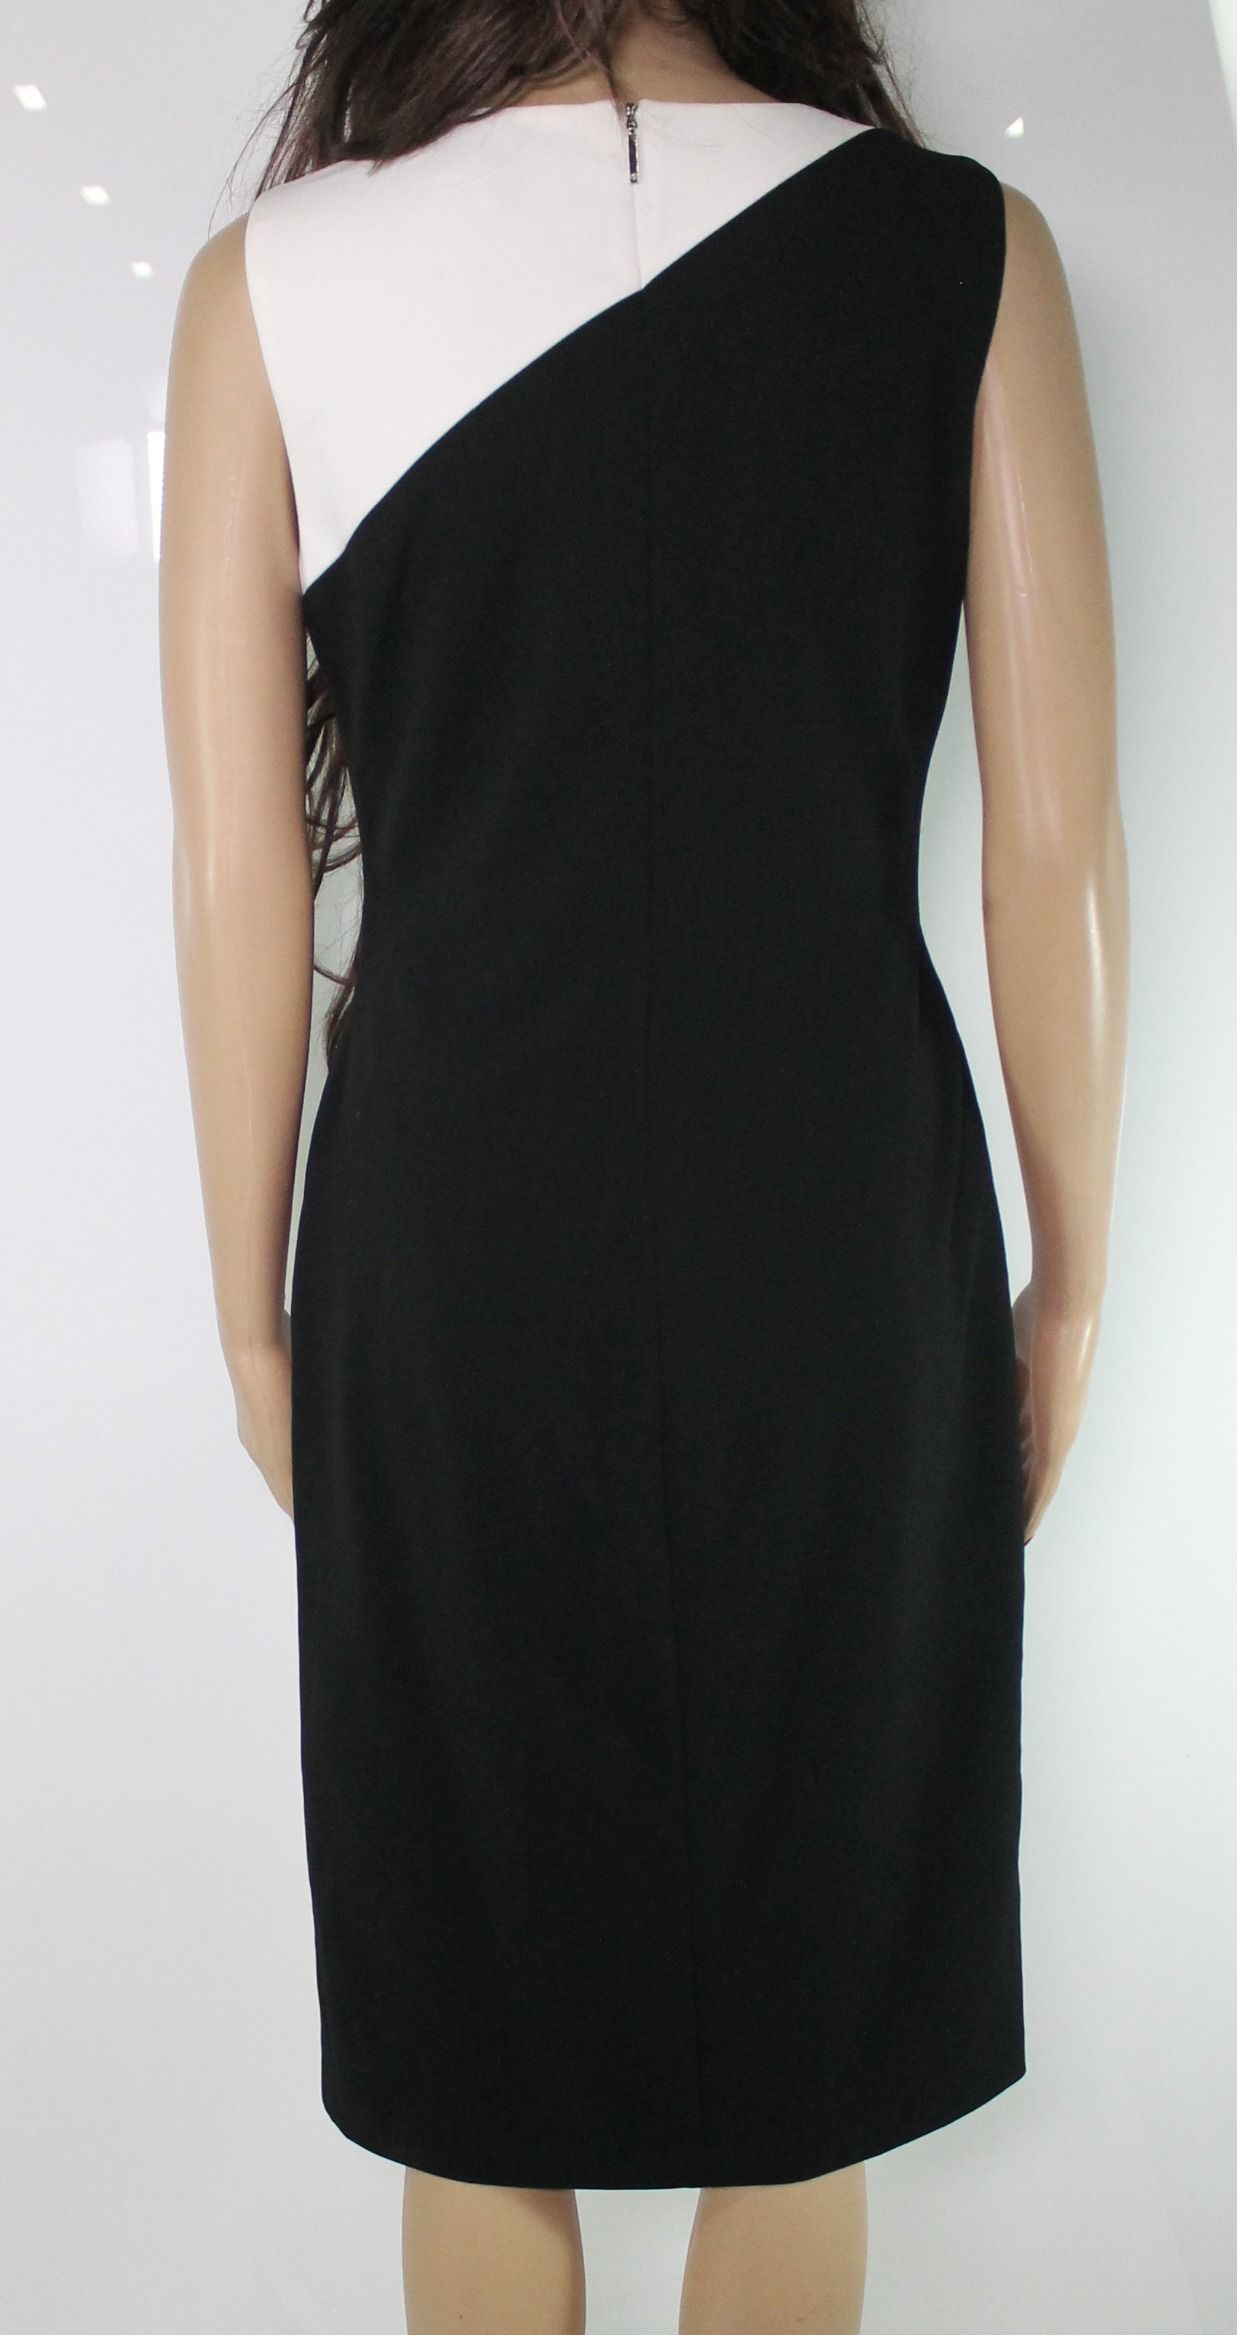 Lauren By Ralph Lauren Women's Dress Black Size 4 Sheath Colorblock